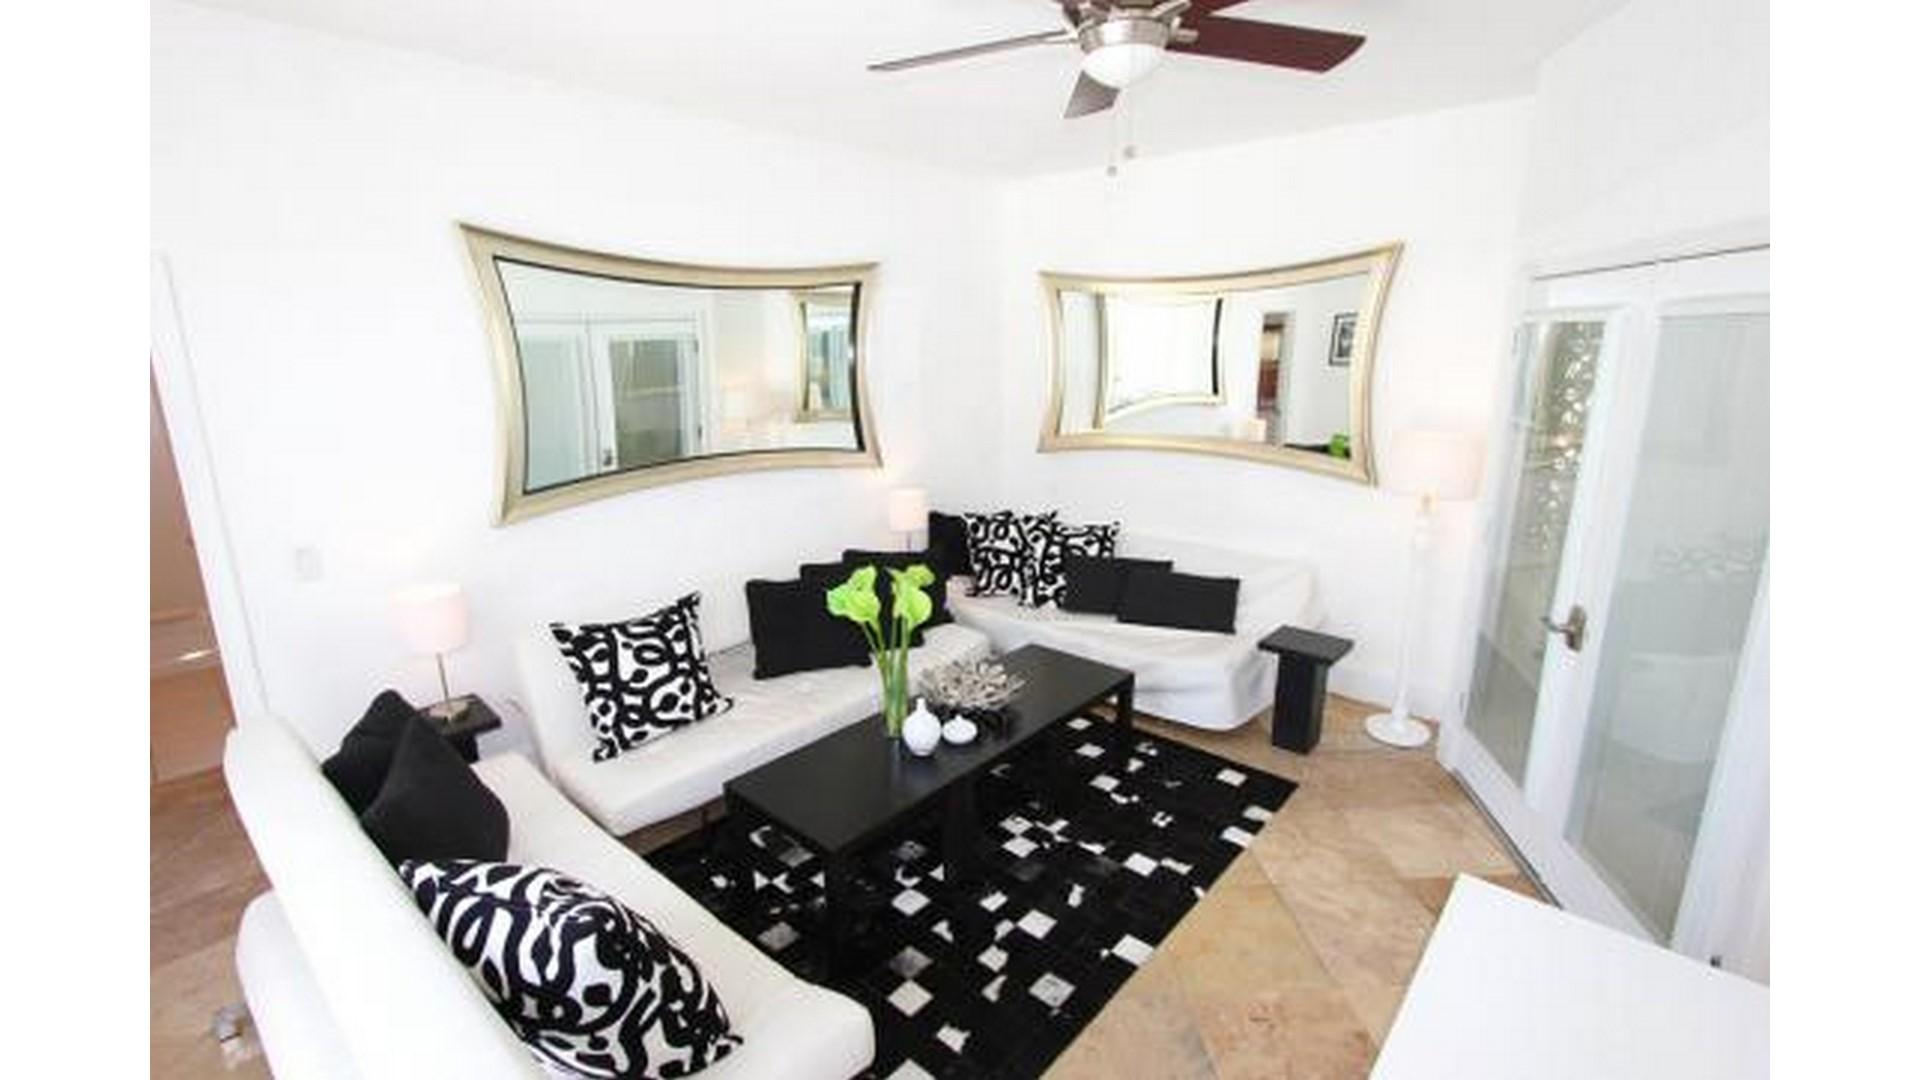 28 Room Disney Area Golf Resort Villas with FREE Tennis, Discount Golf & SPA (Estate+Mansion)